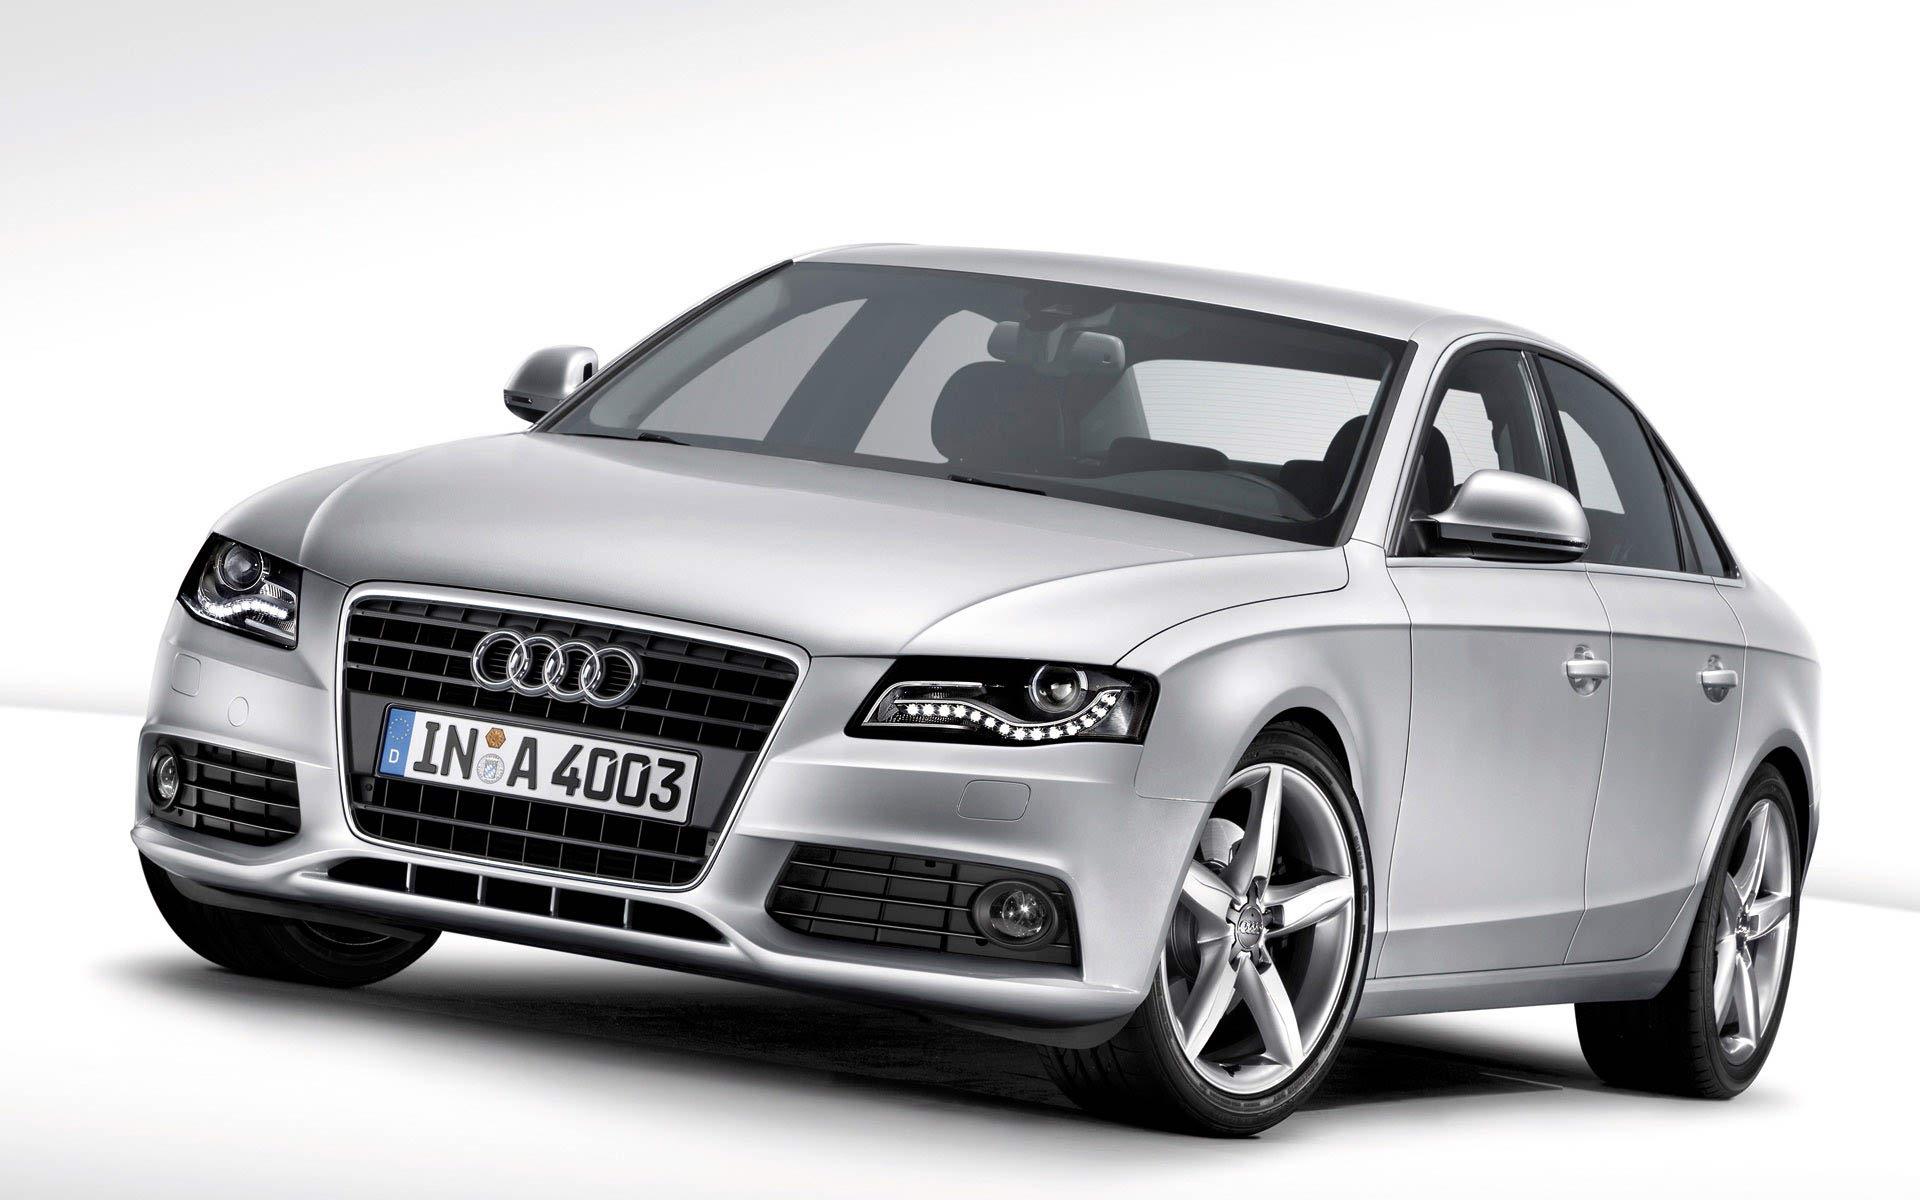 HD Audi Car